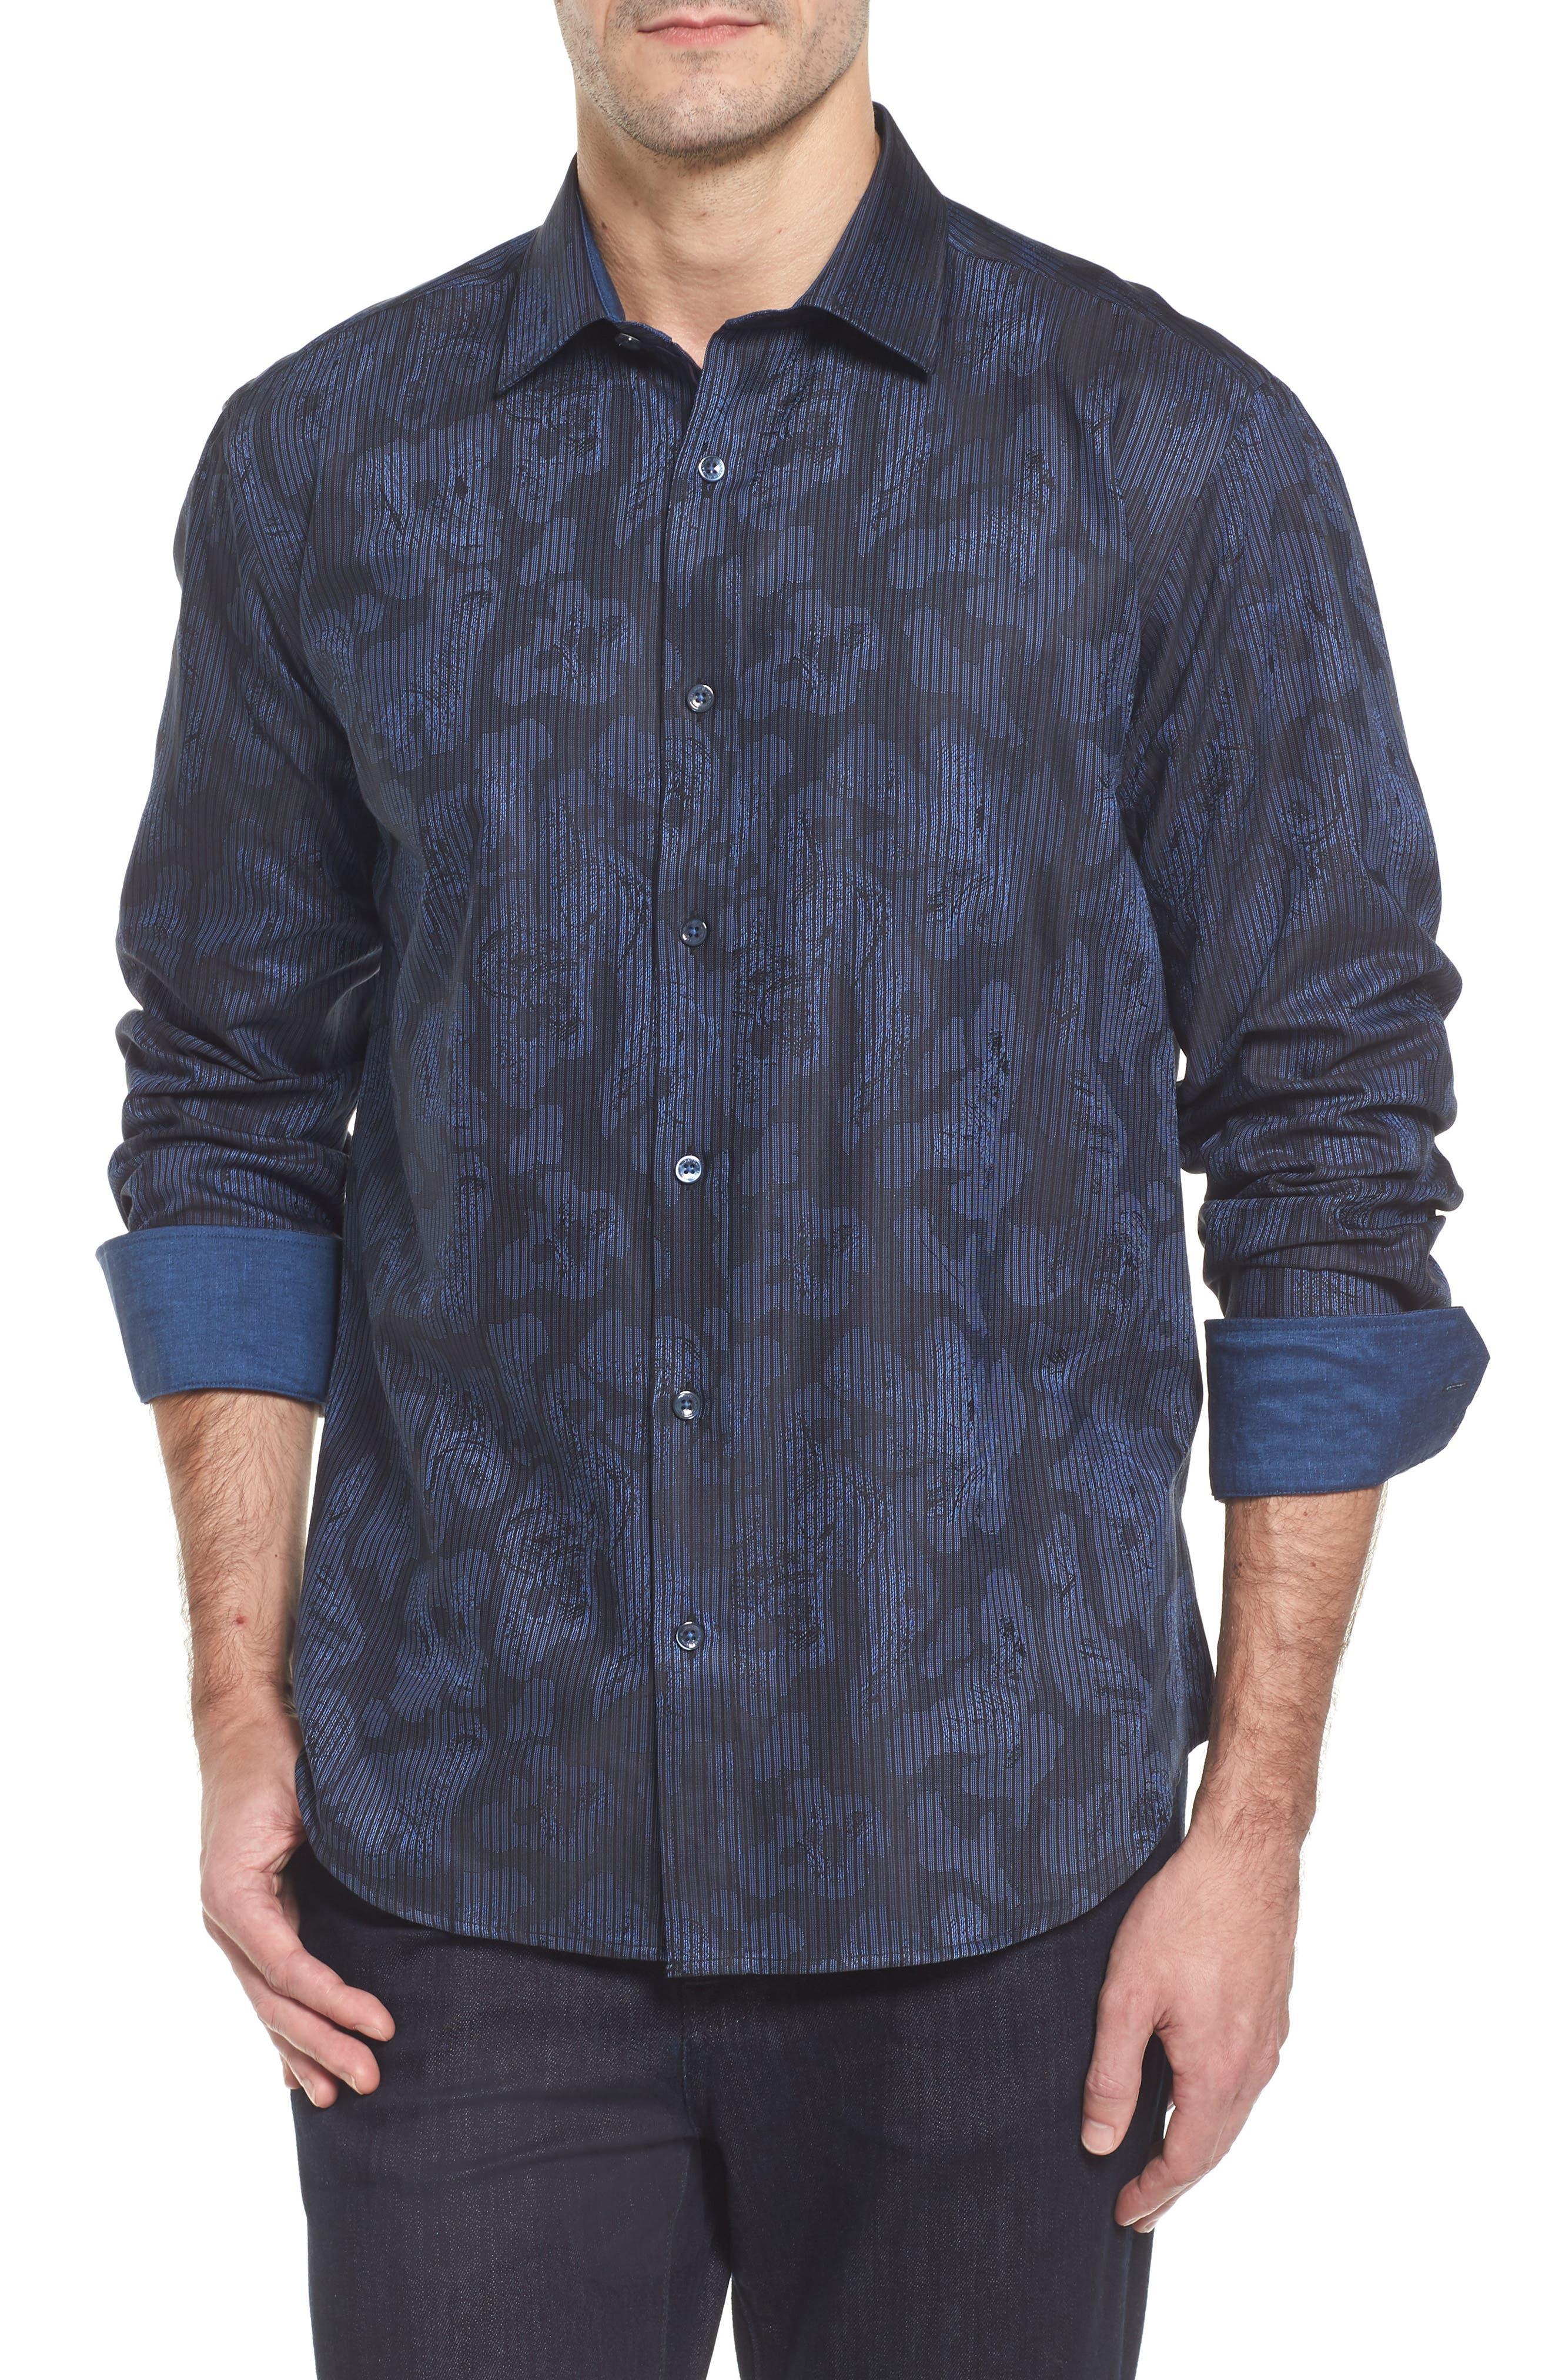 Main Image - Bugatchi Slim Fit Jacquard Stripe Sport Shirt